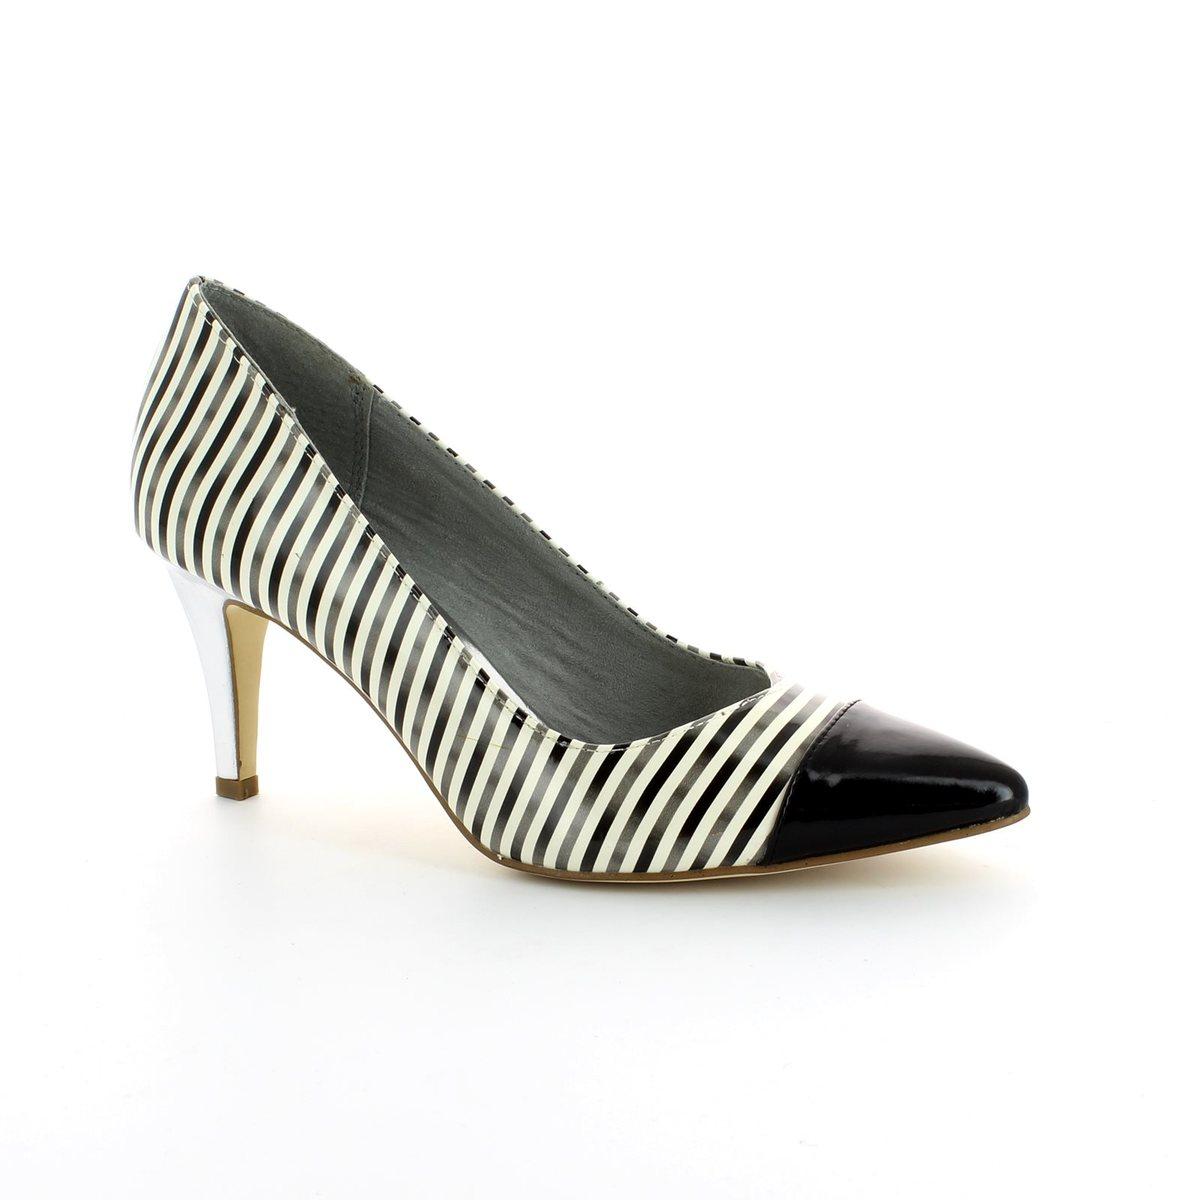 tamaris season 22447 208 black white high heeled shoes. Black Bedroom Furniture Sets. Home Design Ideas